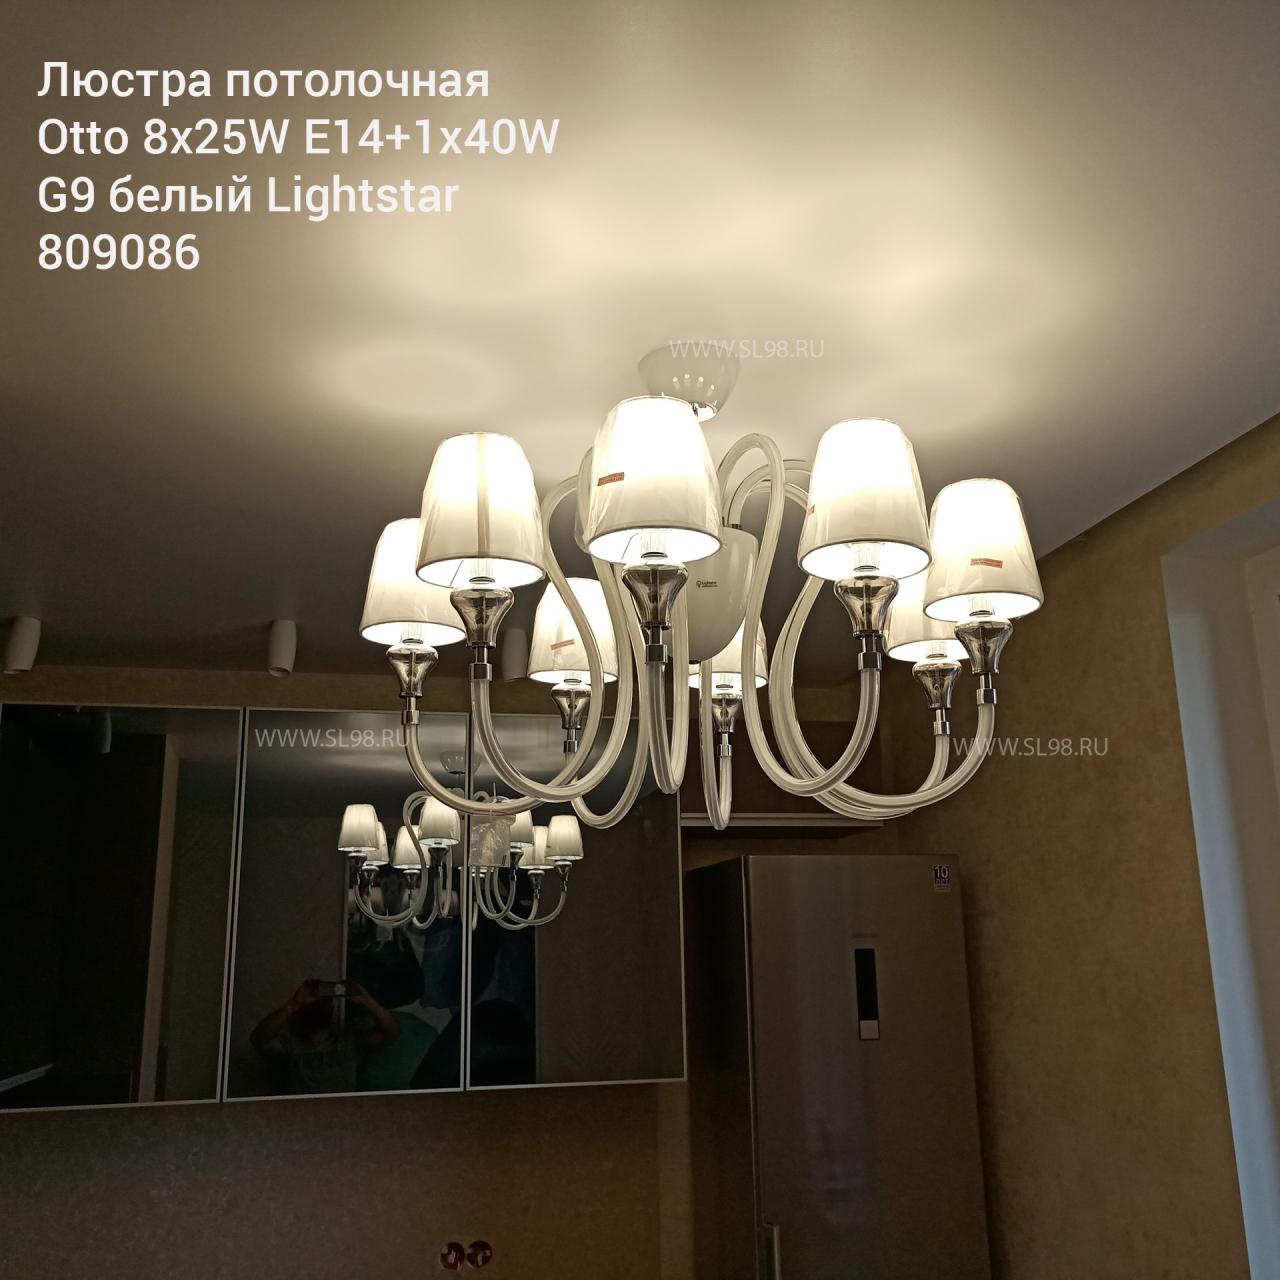 Люстра в интерьере: Люстра потолочная Otto 8х25W E14+1х40W G9 белый Lightstar 809086